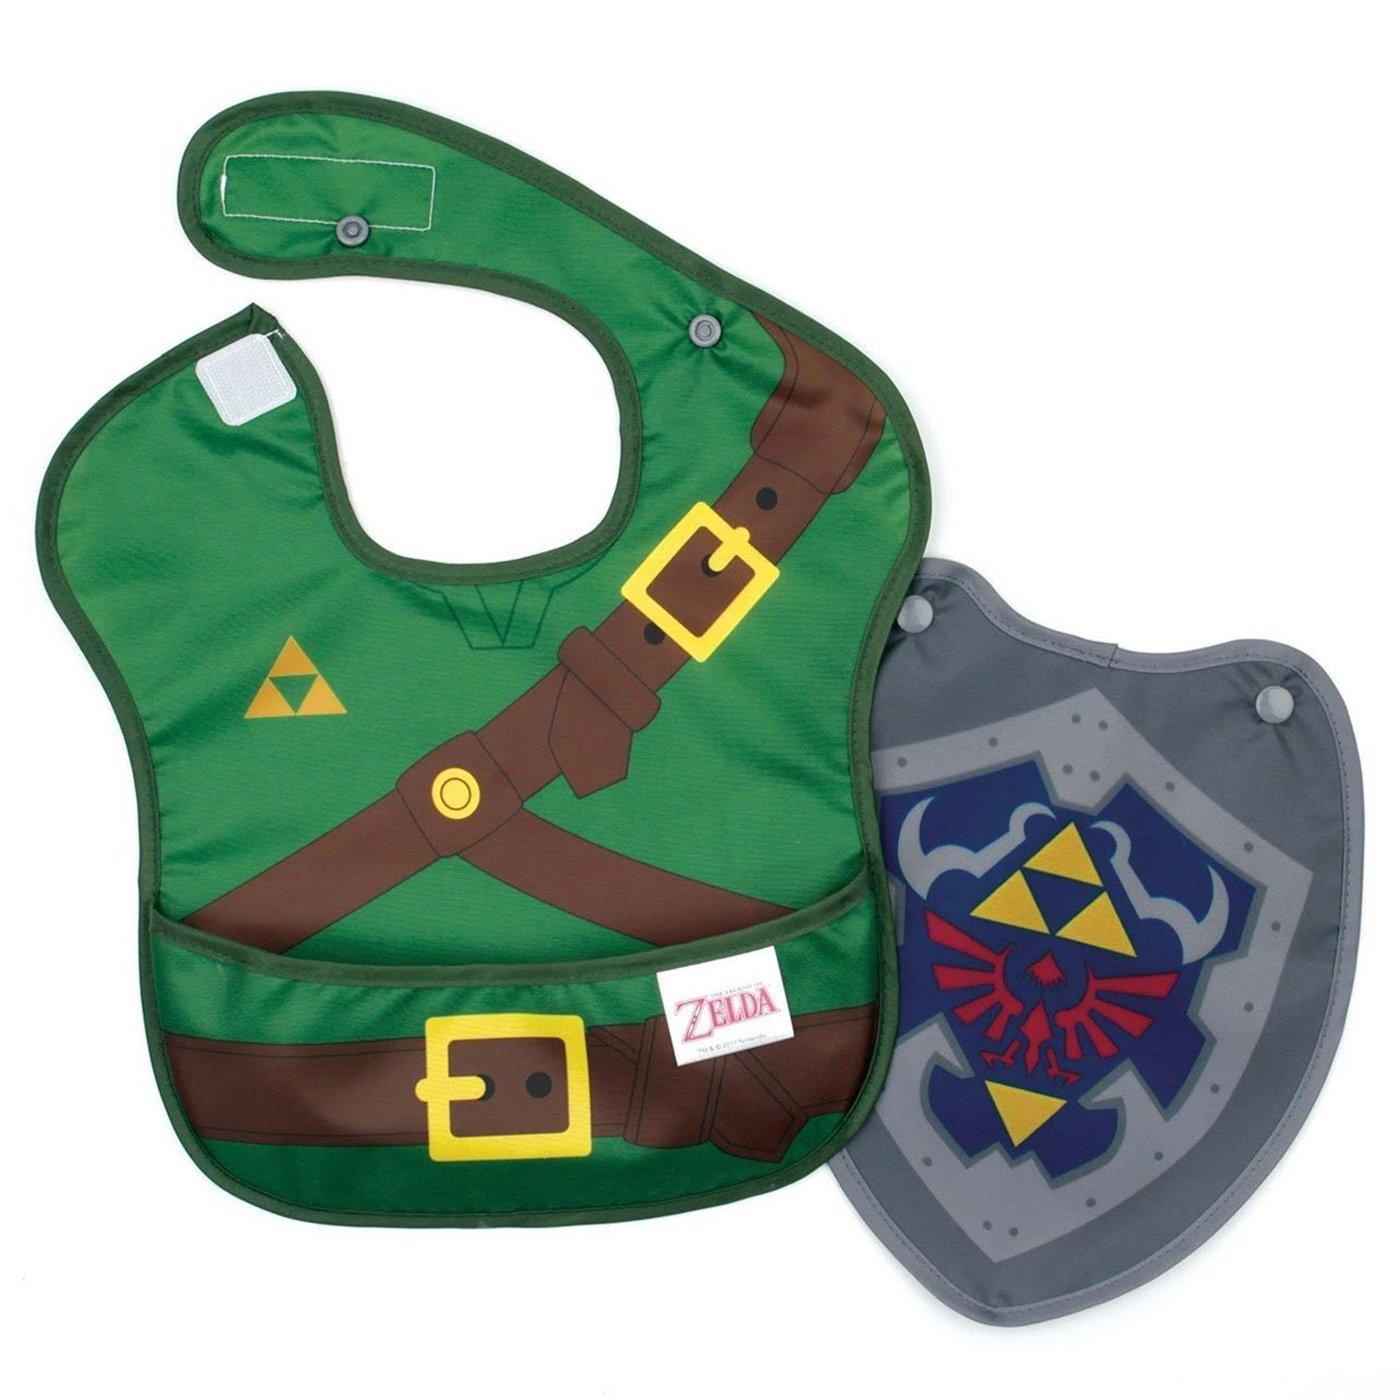 Legend of Zelda Link Costume Sleeved Bib